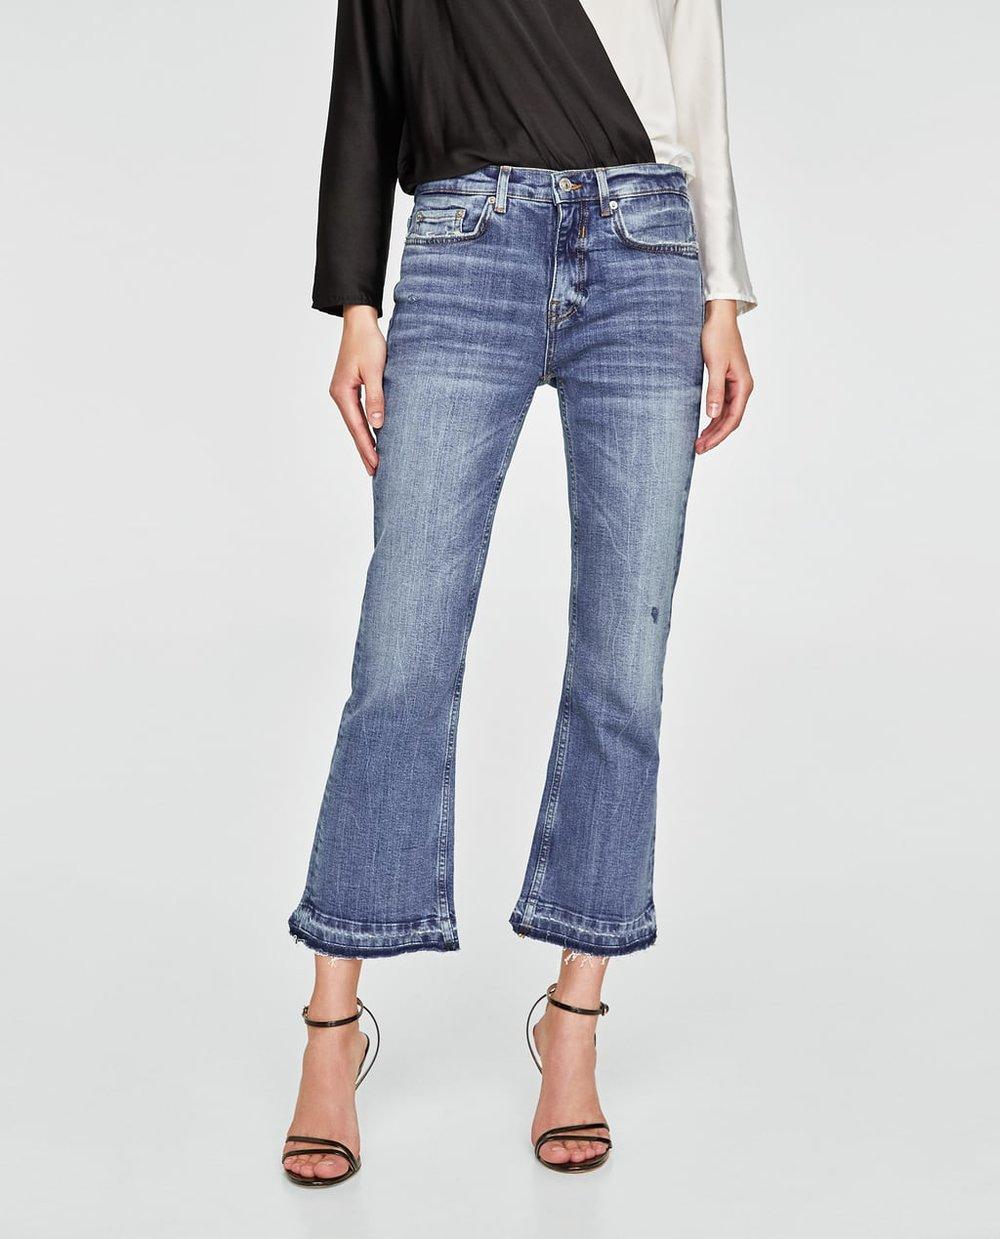 https://www.zara.com/ca/en/jeans-bootcut-california-blue-p04124241.html?v1=5322608&v2=719019